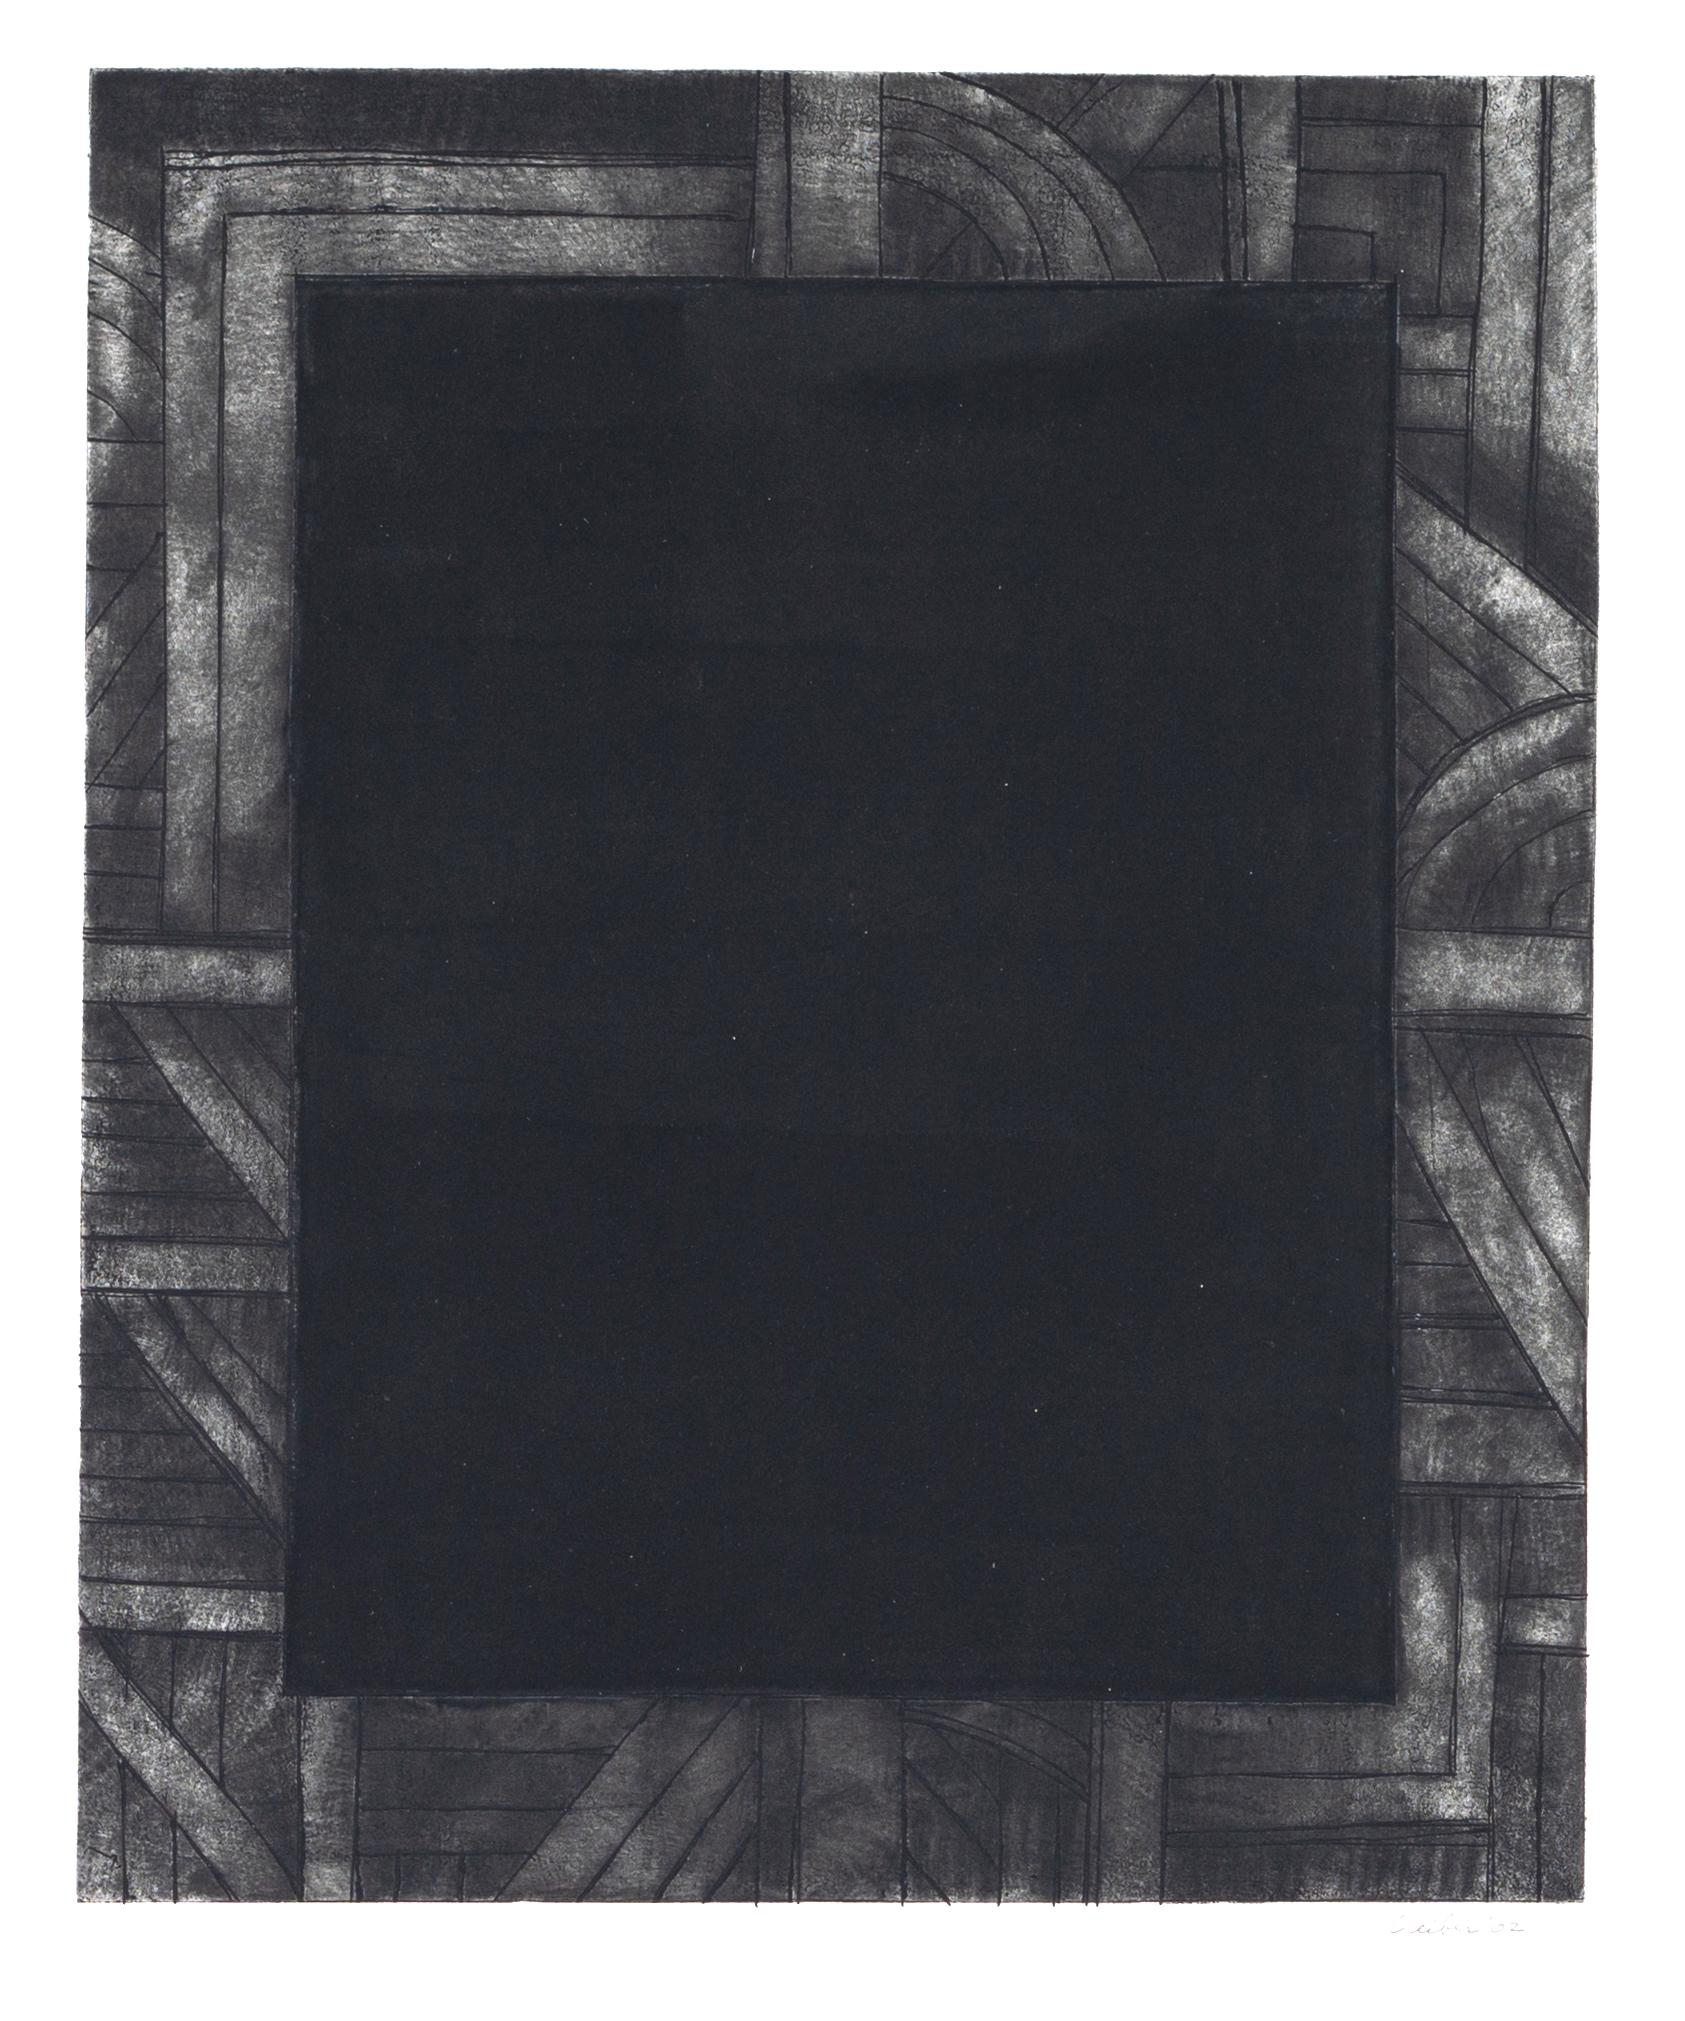 Number 1, 2002